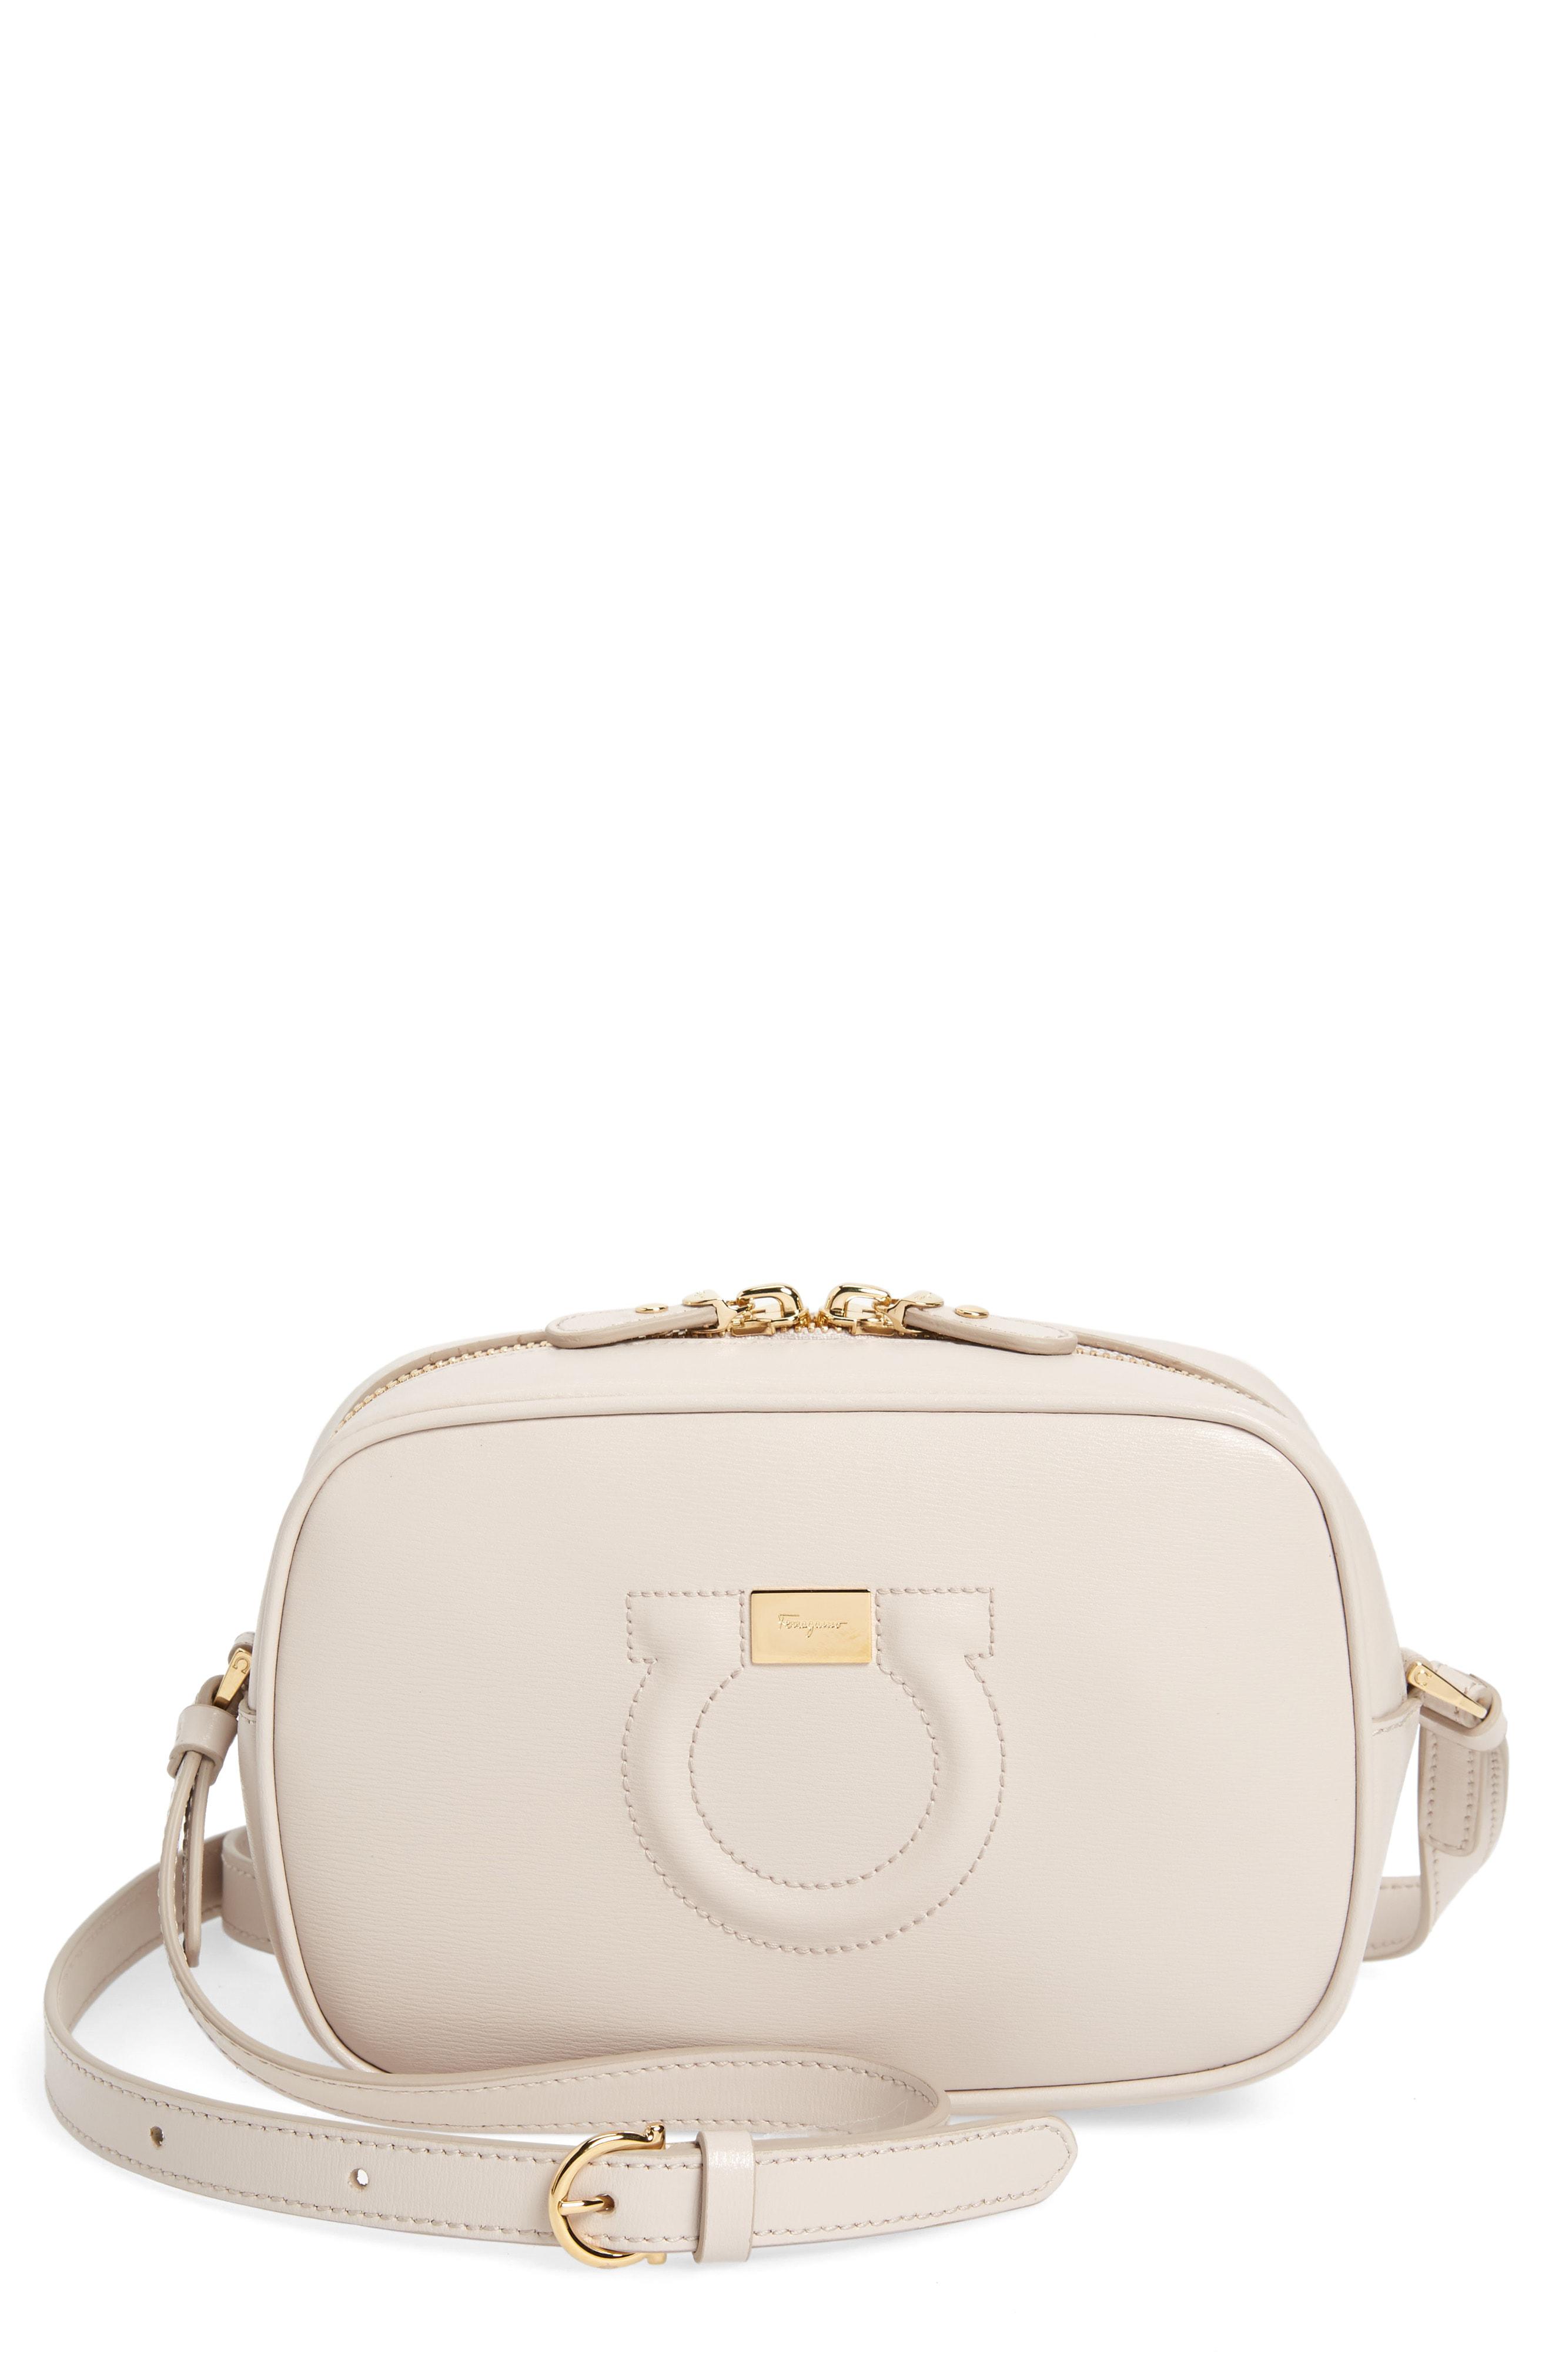 32939c41fa ... this iconic Gancio City camera bag from Salvatore Ferragamo features a  detachable and adjustable shoulder strap